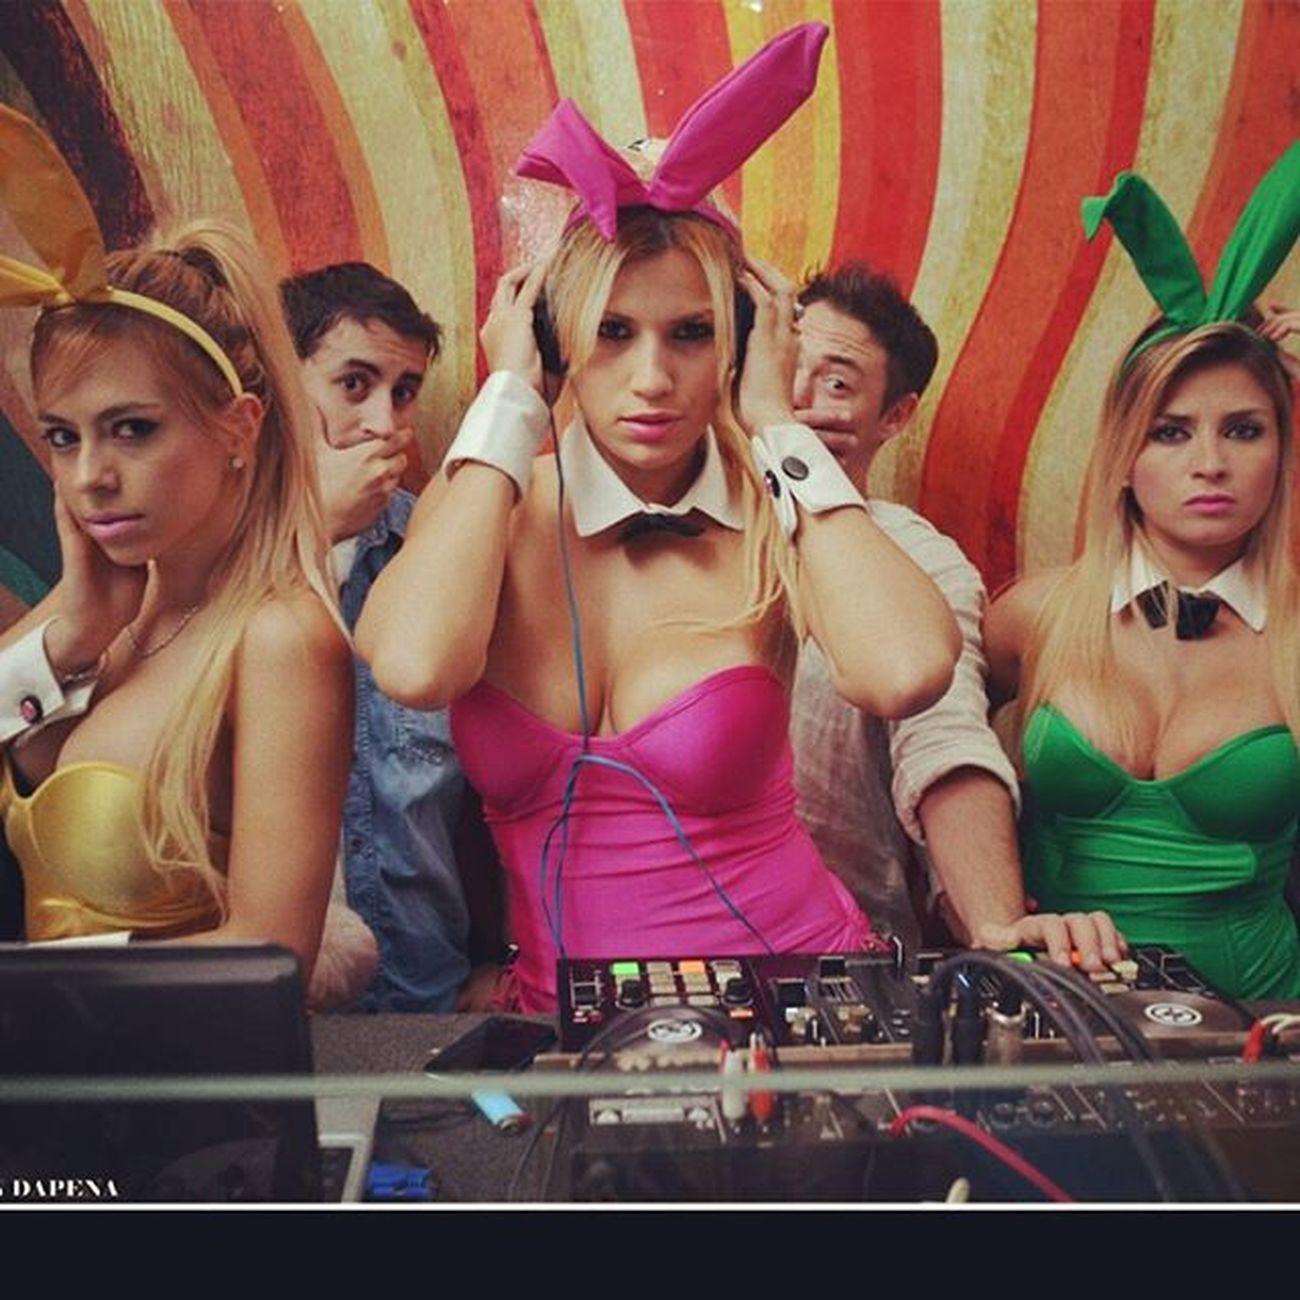 Playboydj 2015  Bunnies Glamorous  Show Bunnies Playmates Photoo Presents Unico en Sudamerica Be Playboyculture Fantasy Night by Playboycondoms Playboyintimates Playboyfragrances